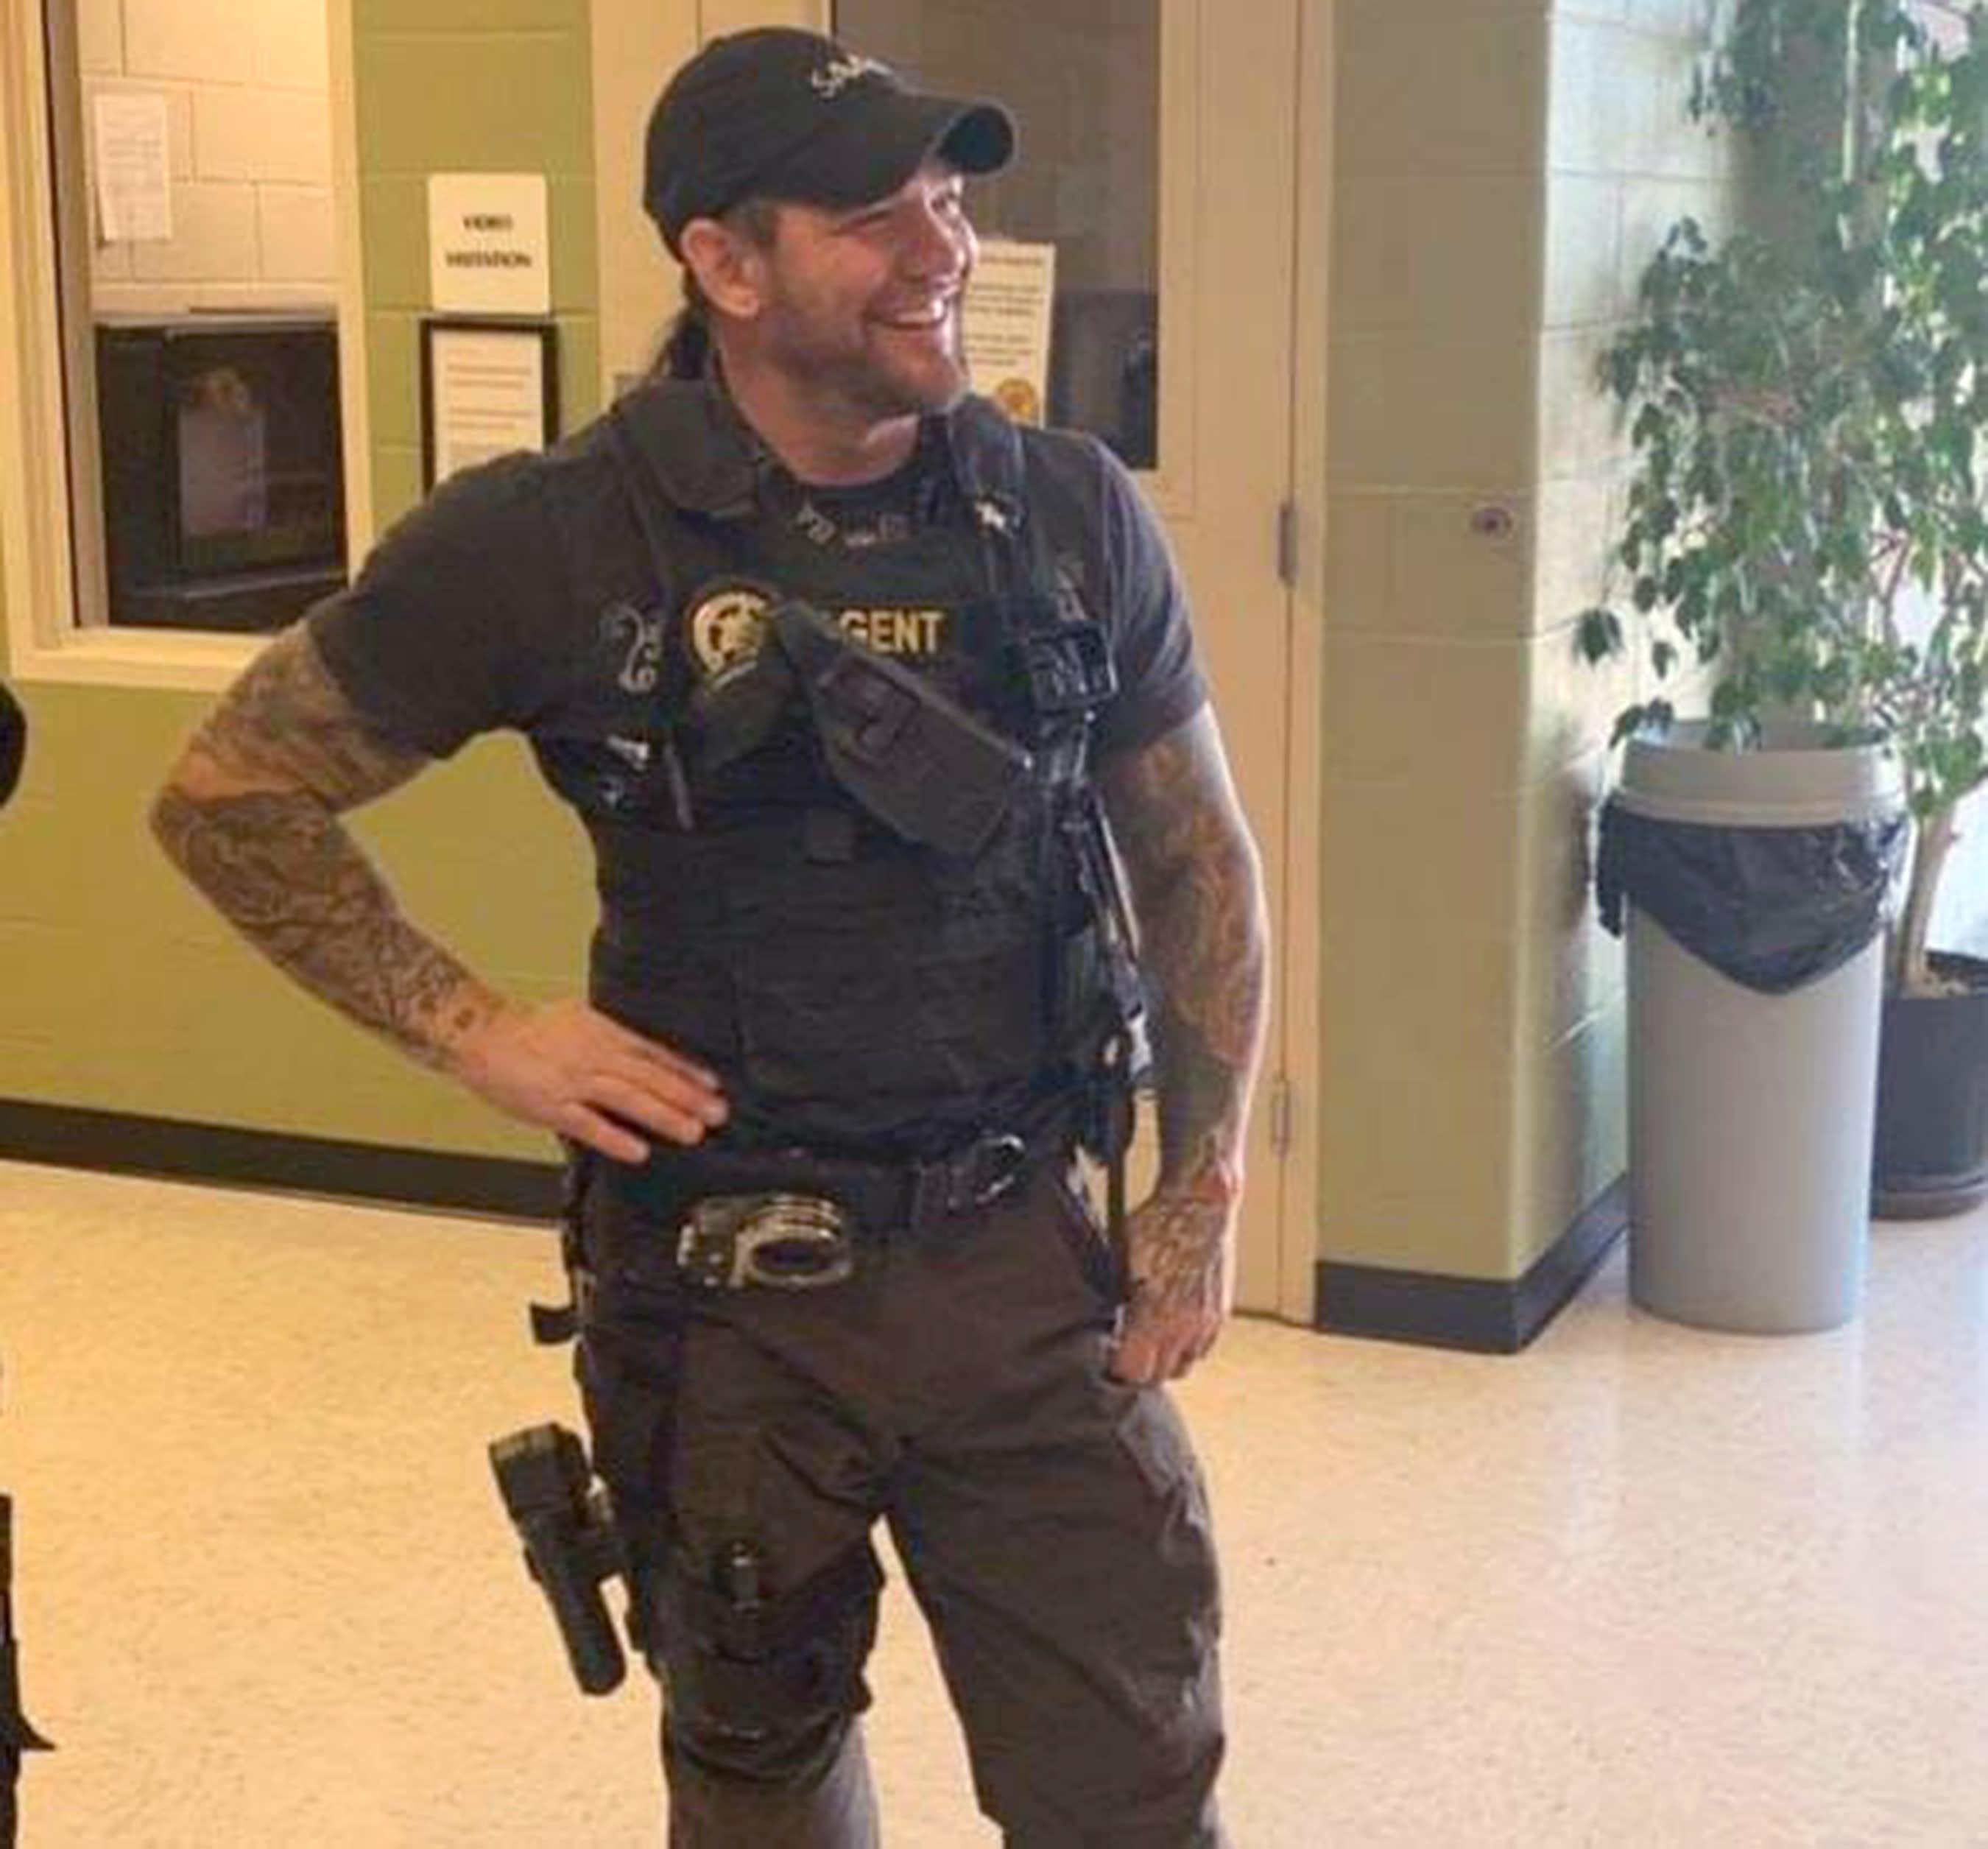 Dog The Bounty Hunters Son Leland Chapman Delivers Fugitive